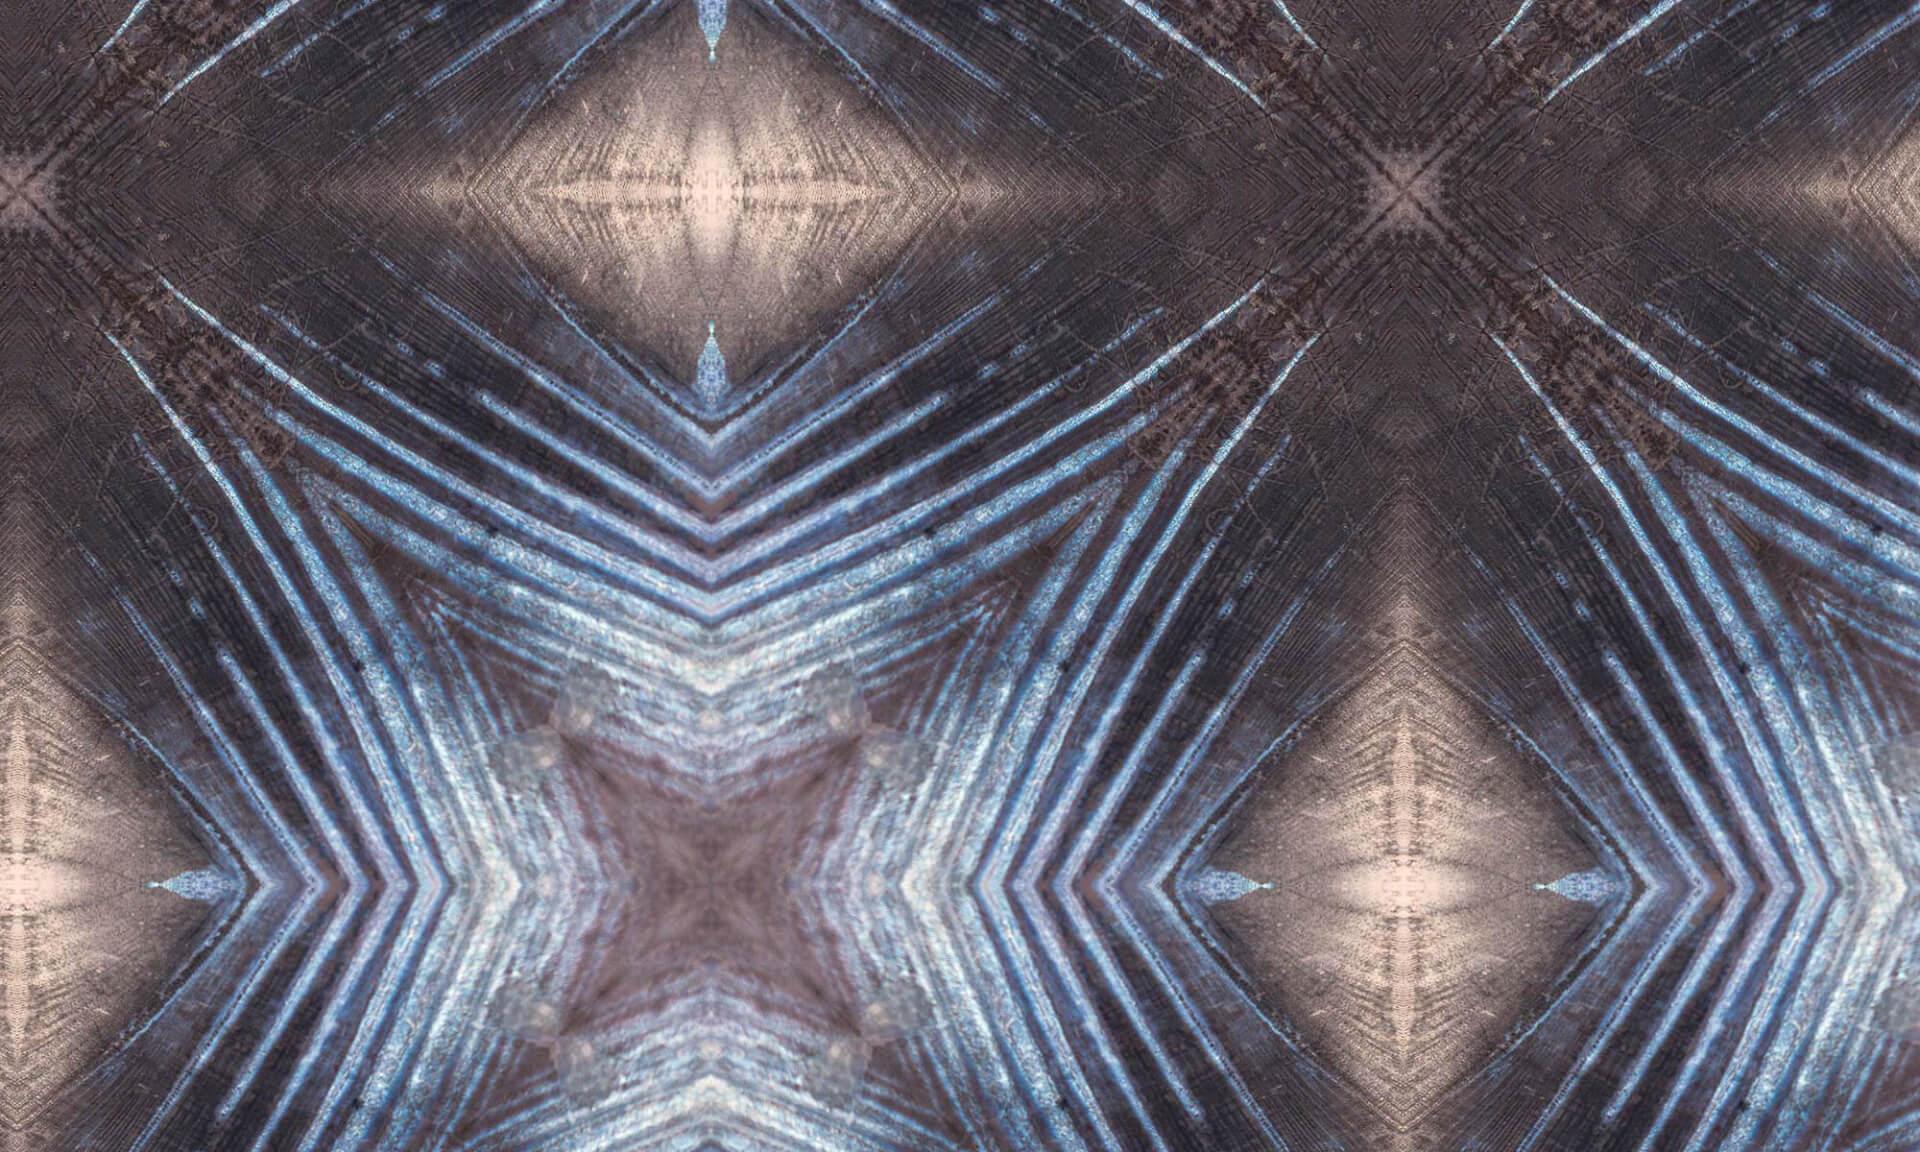 Mackerel Fin BA0709-B Doug Garrabrants